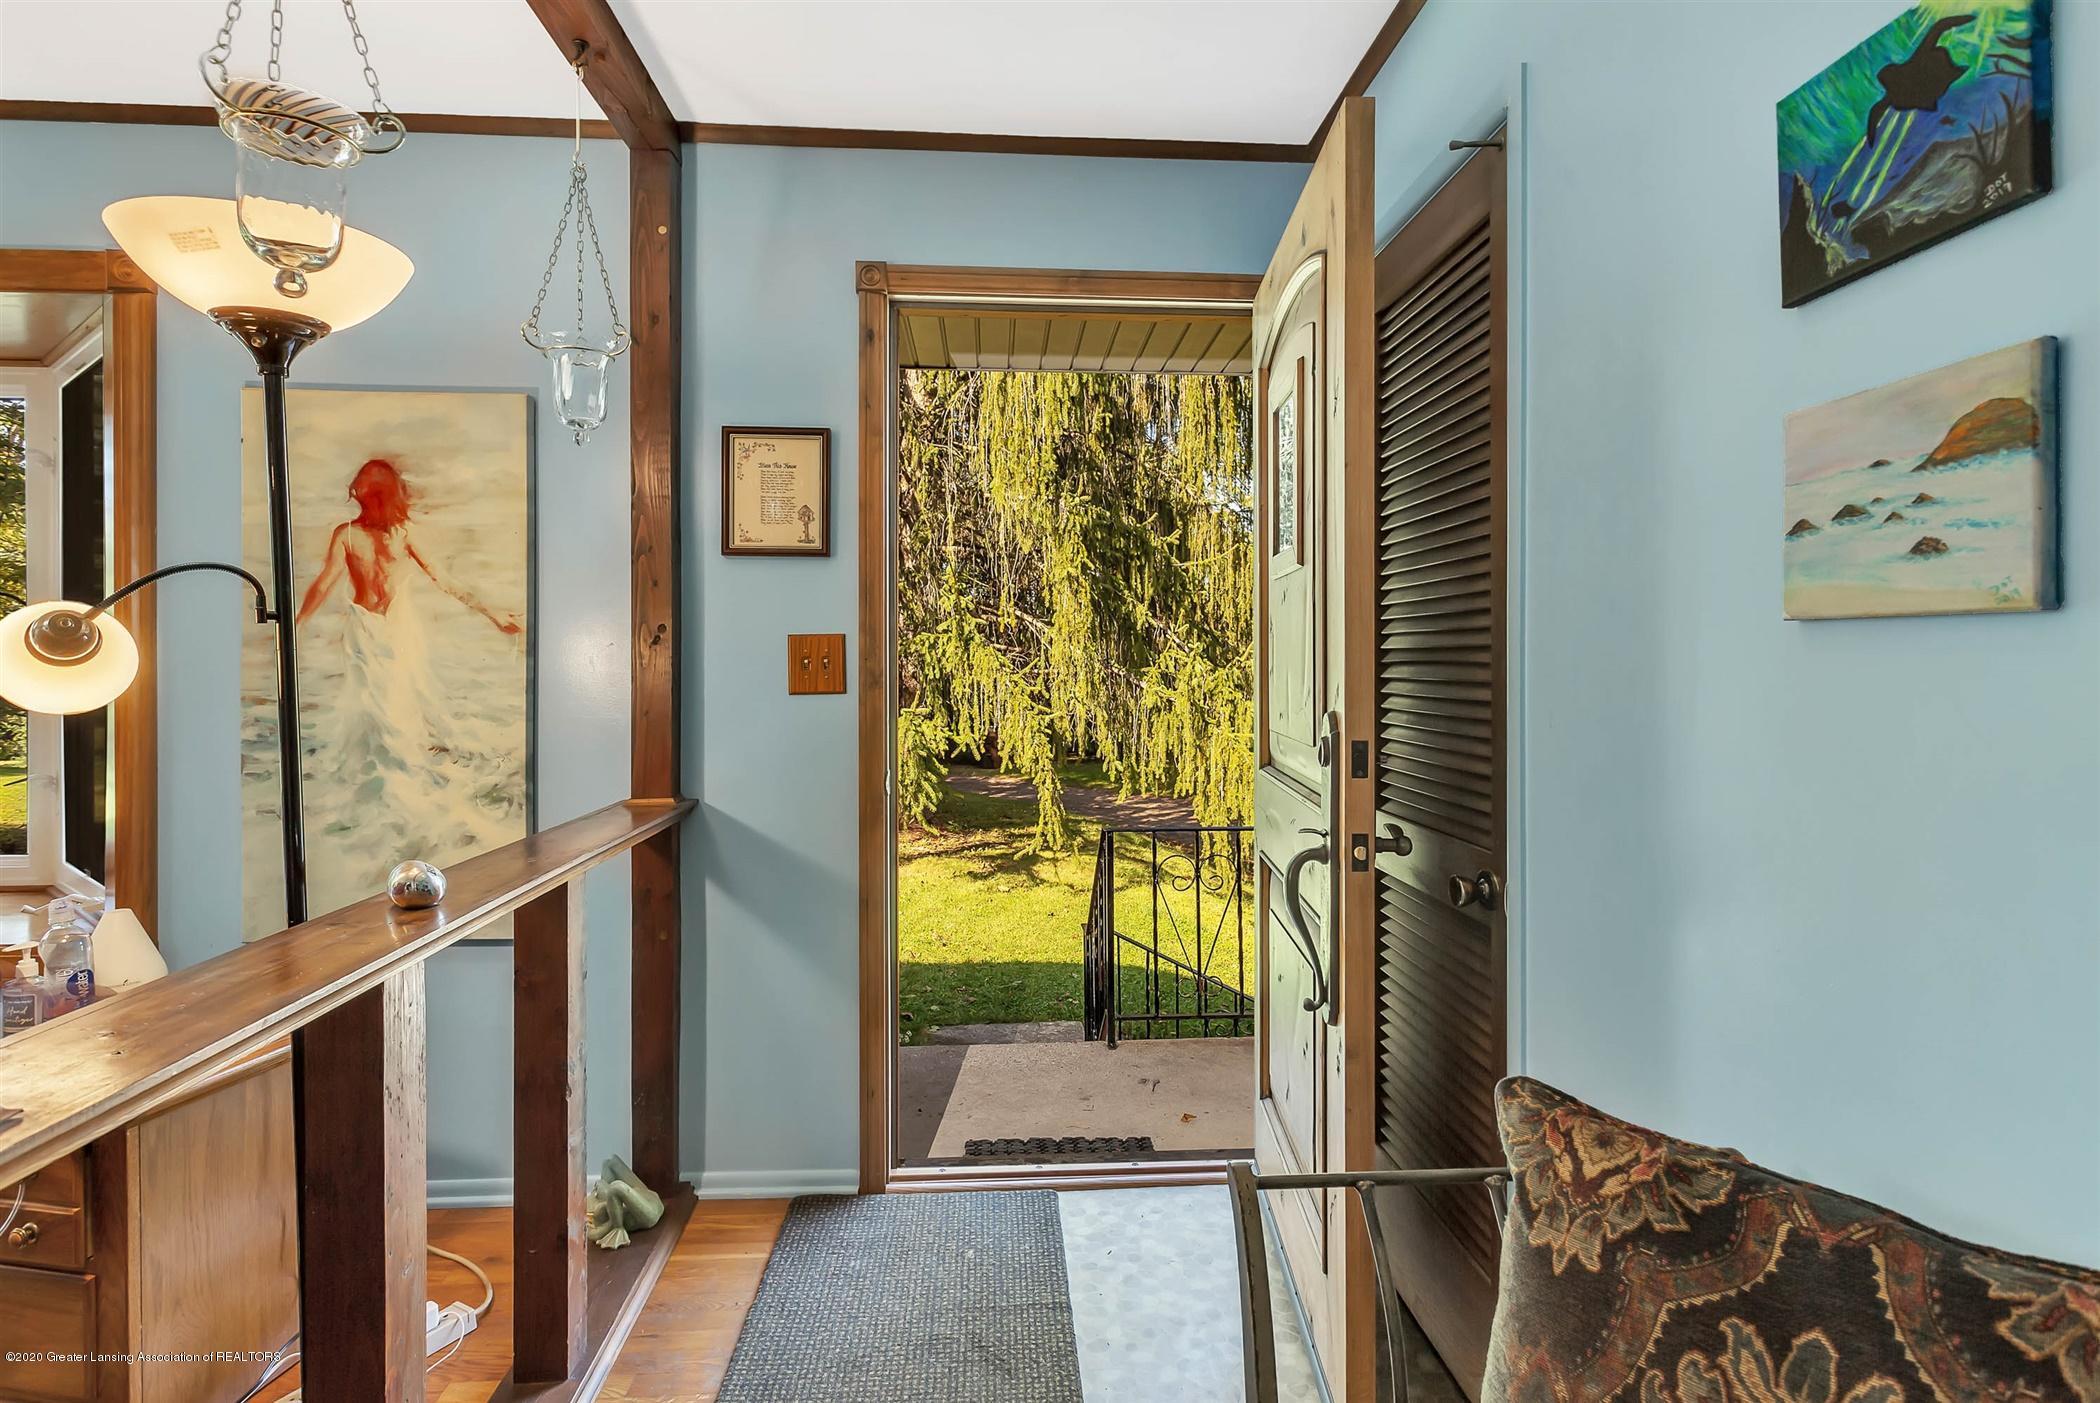 5110 E Clark Rd - 07-5110 Clark Rd-WindowStill-Real-E - 7